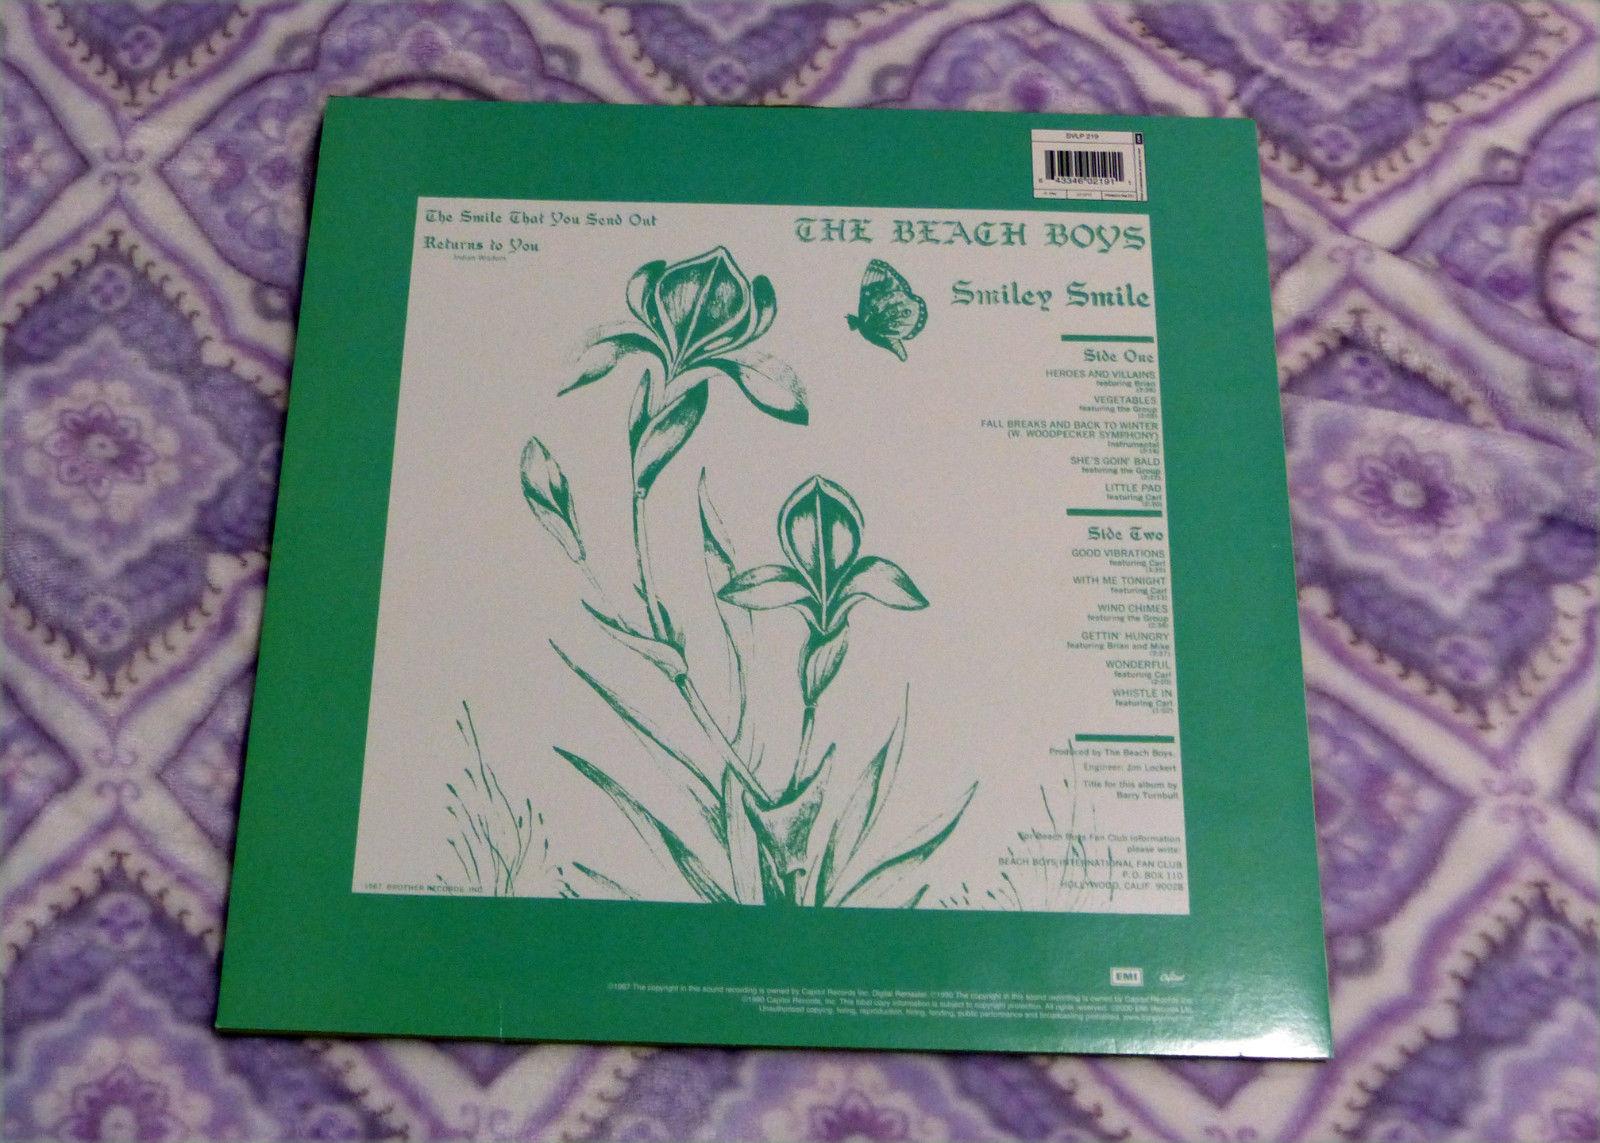 The Beach Boys - Smiley Smile - Vinyl LP  SVLP 219 EMI Capitol Audiophile Exc.